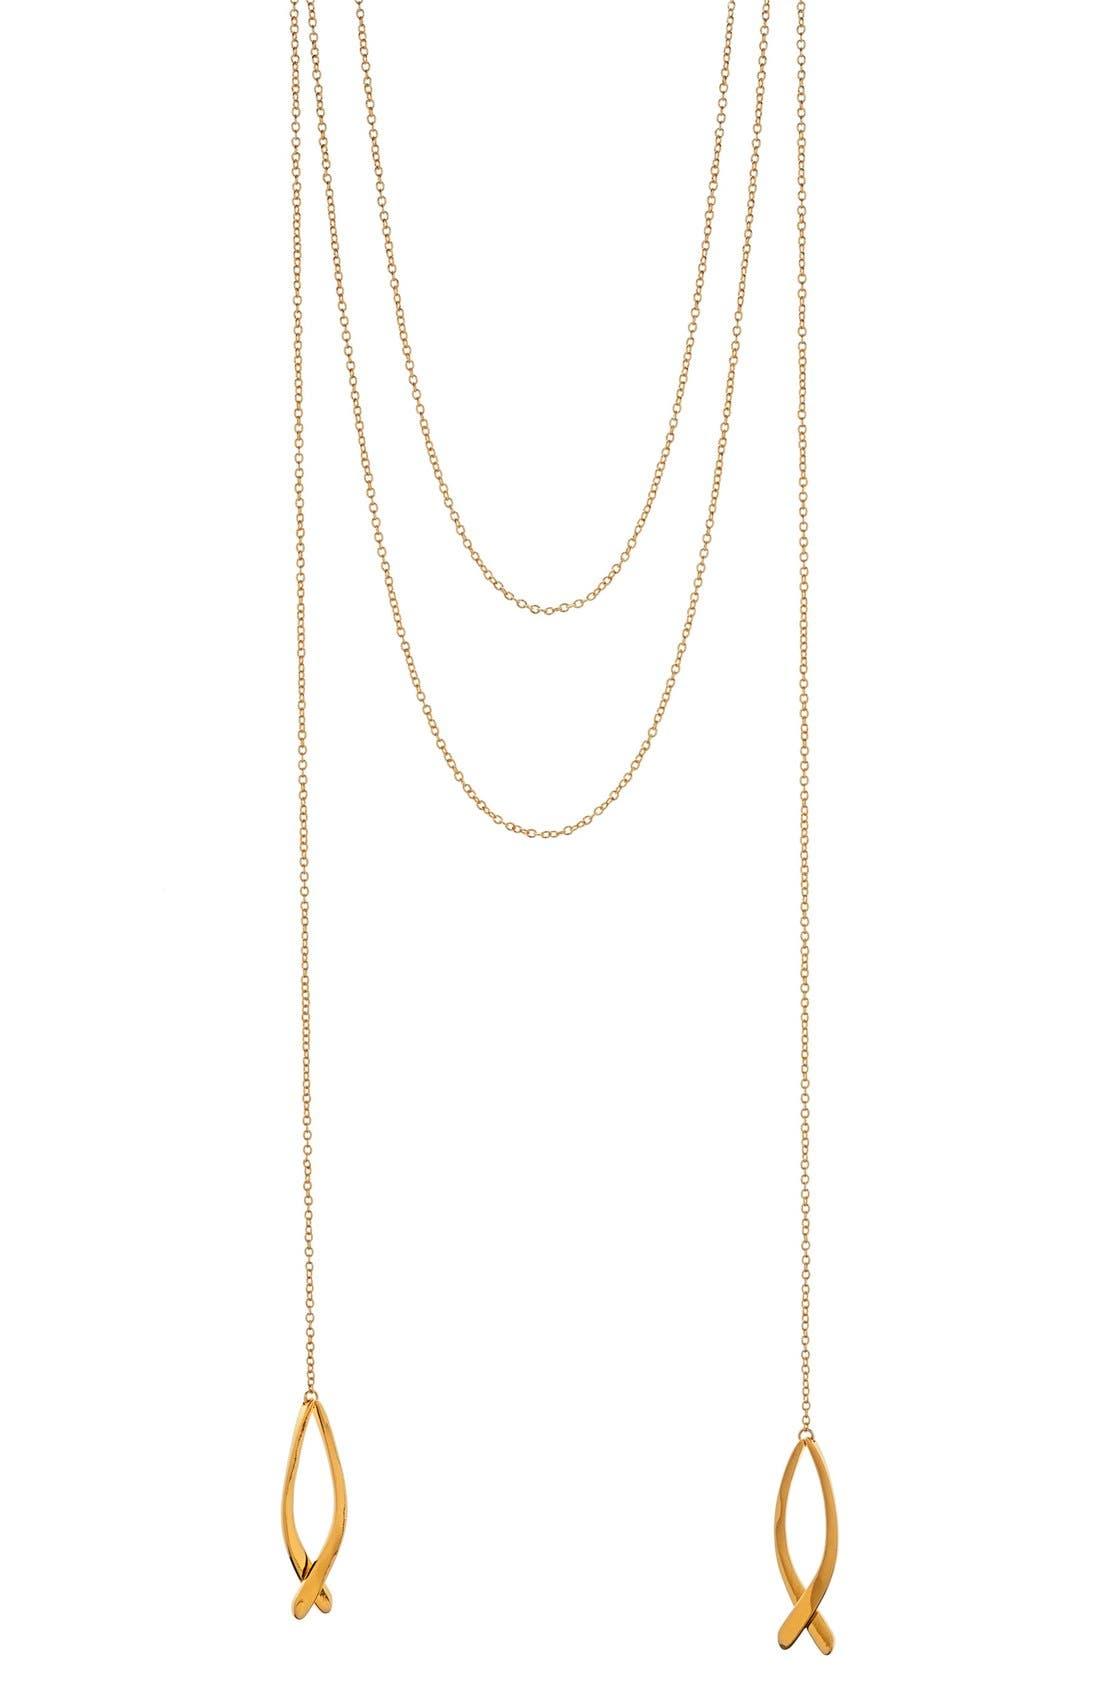 Main Image - gorjana'Viola' Layered Pendant Necklace